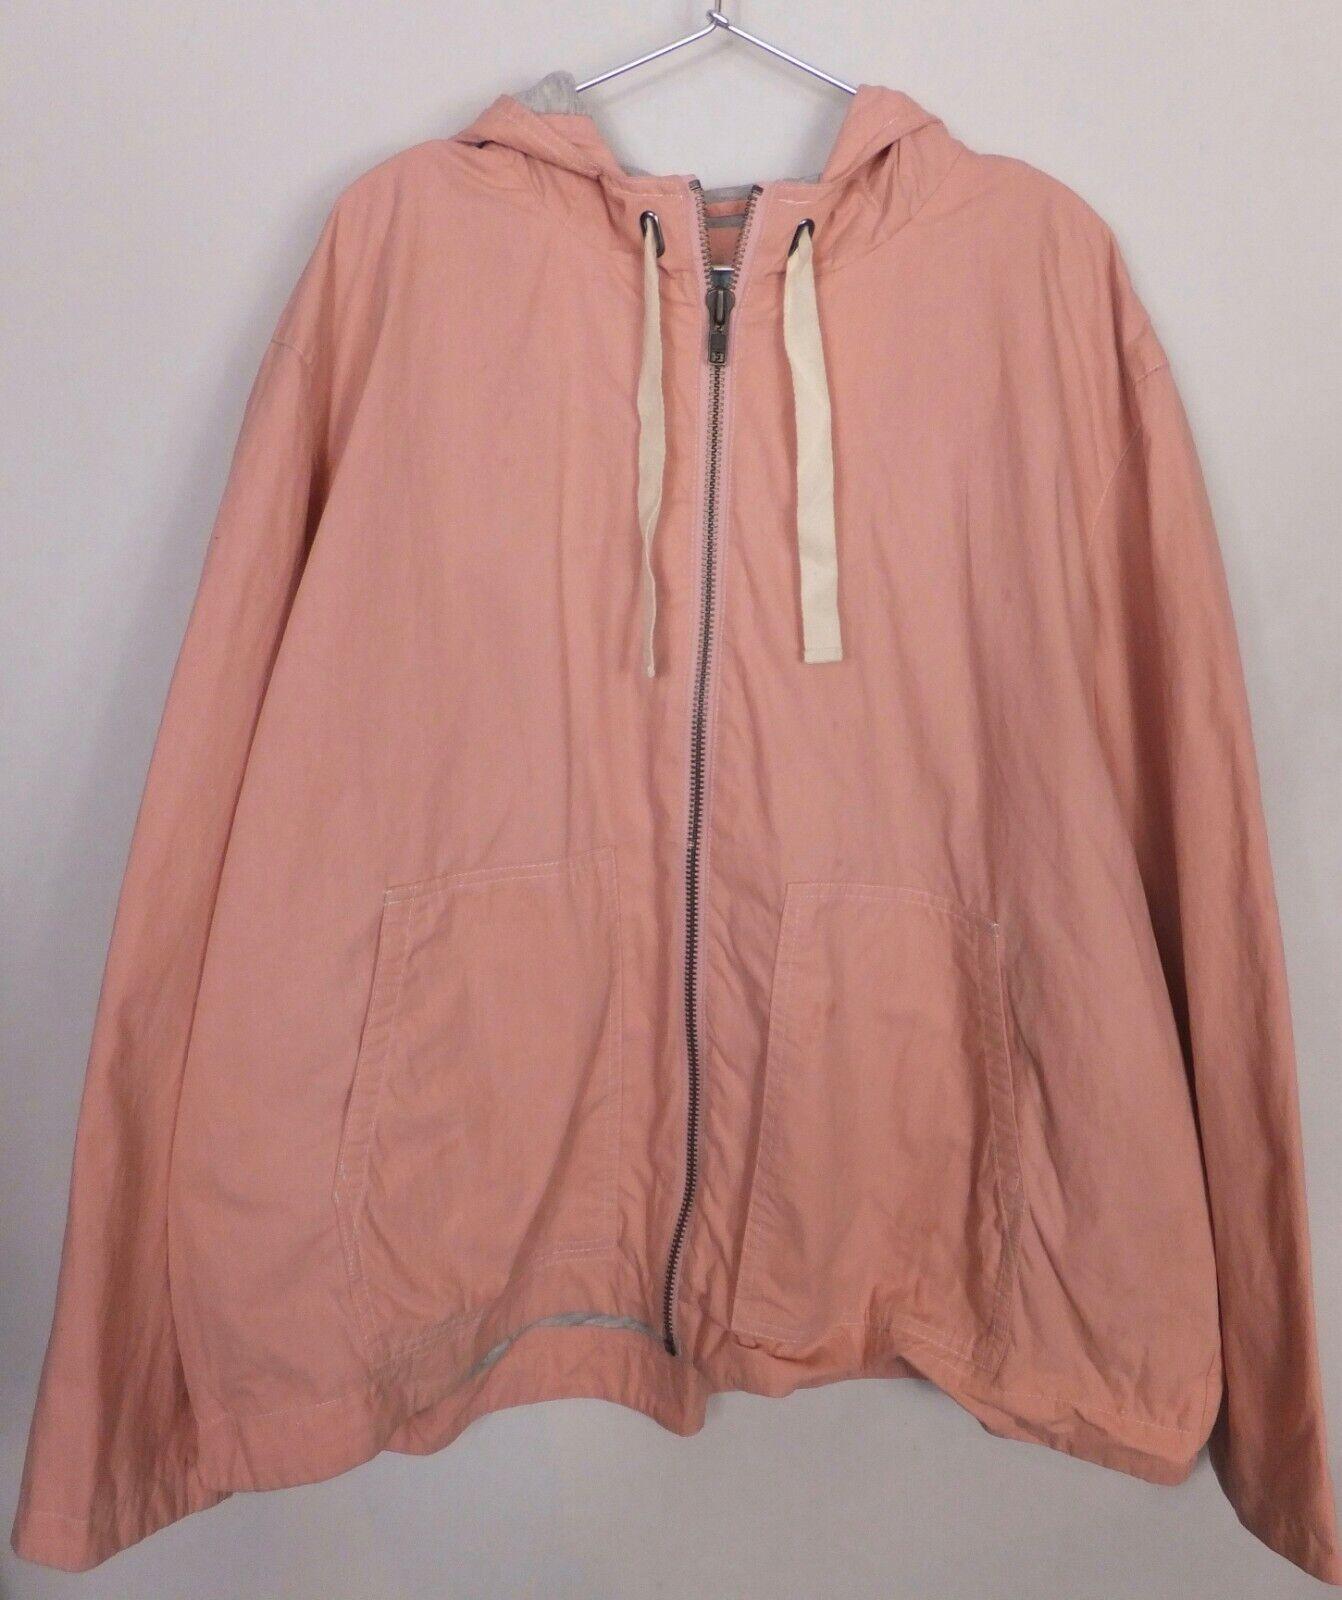 New Women's Boden Salmon Pink Hooded Light Weight Rain Jacket Size 20